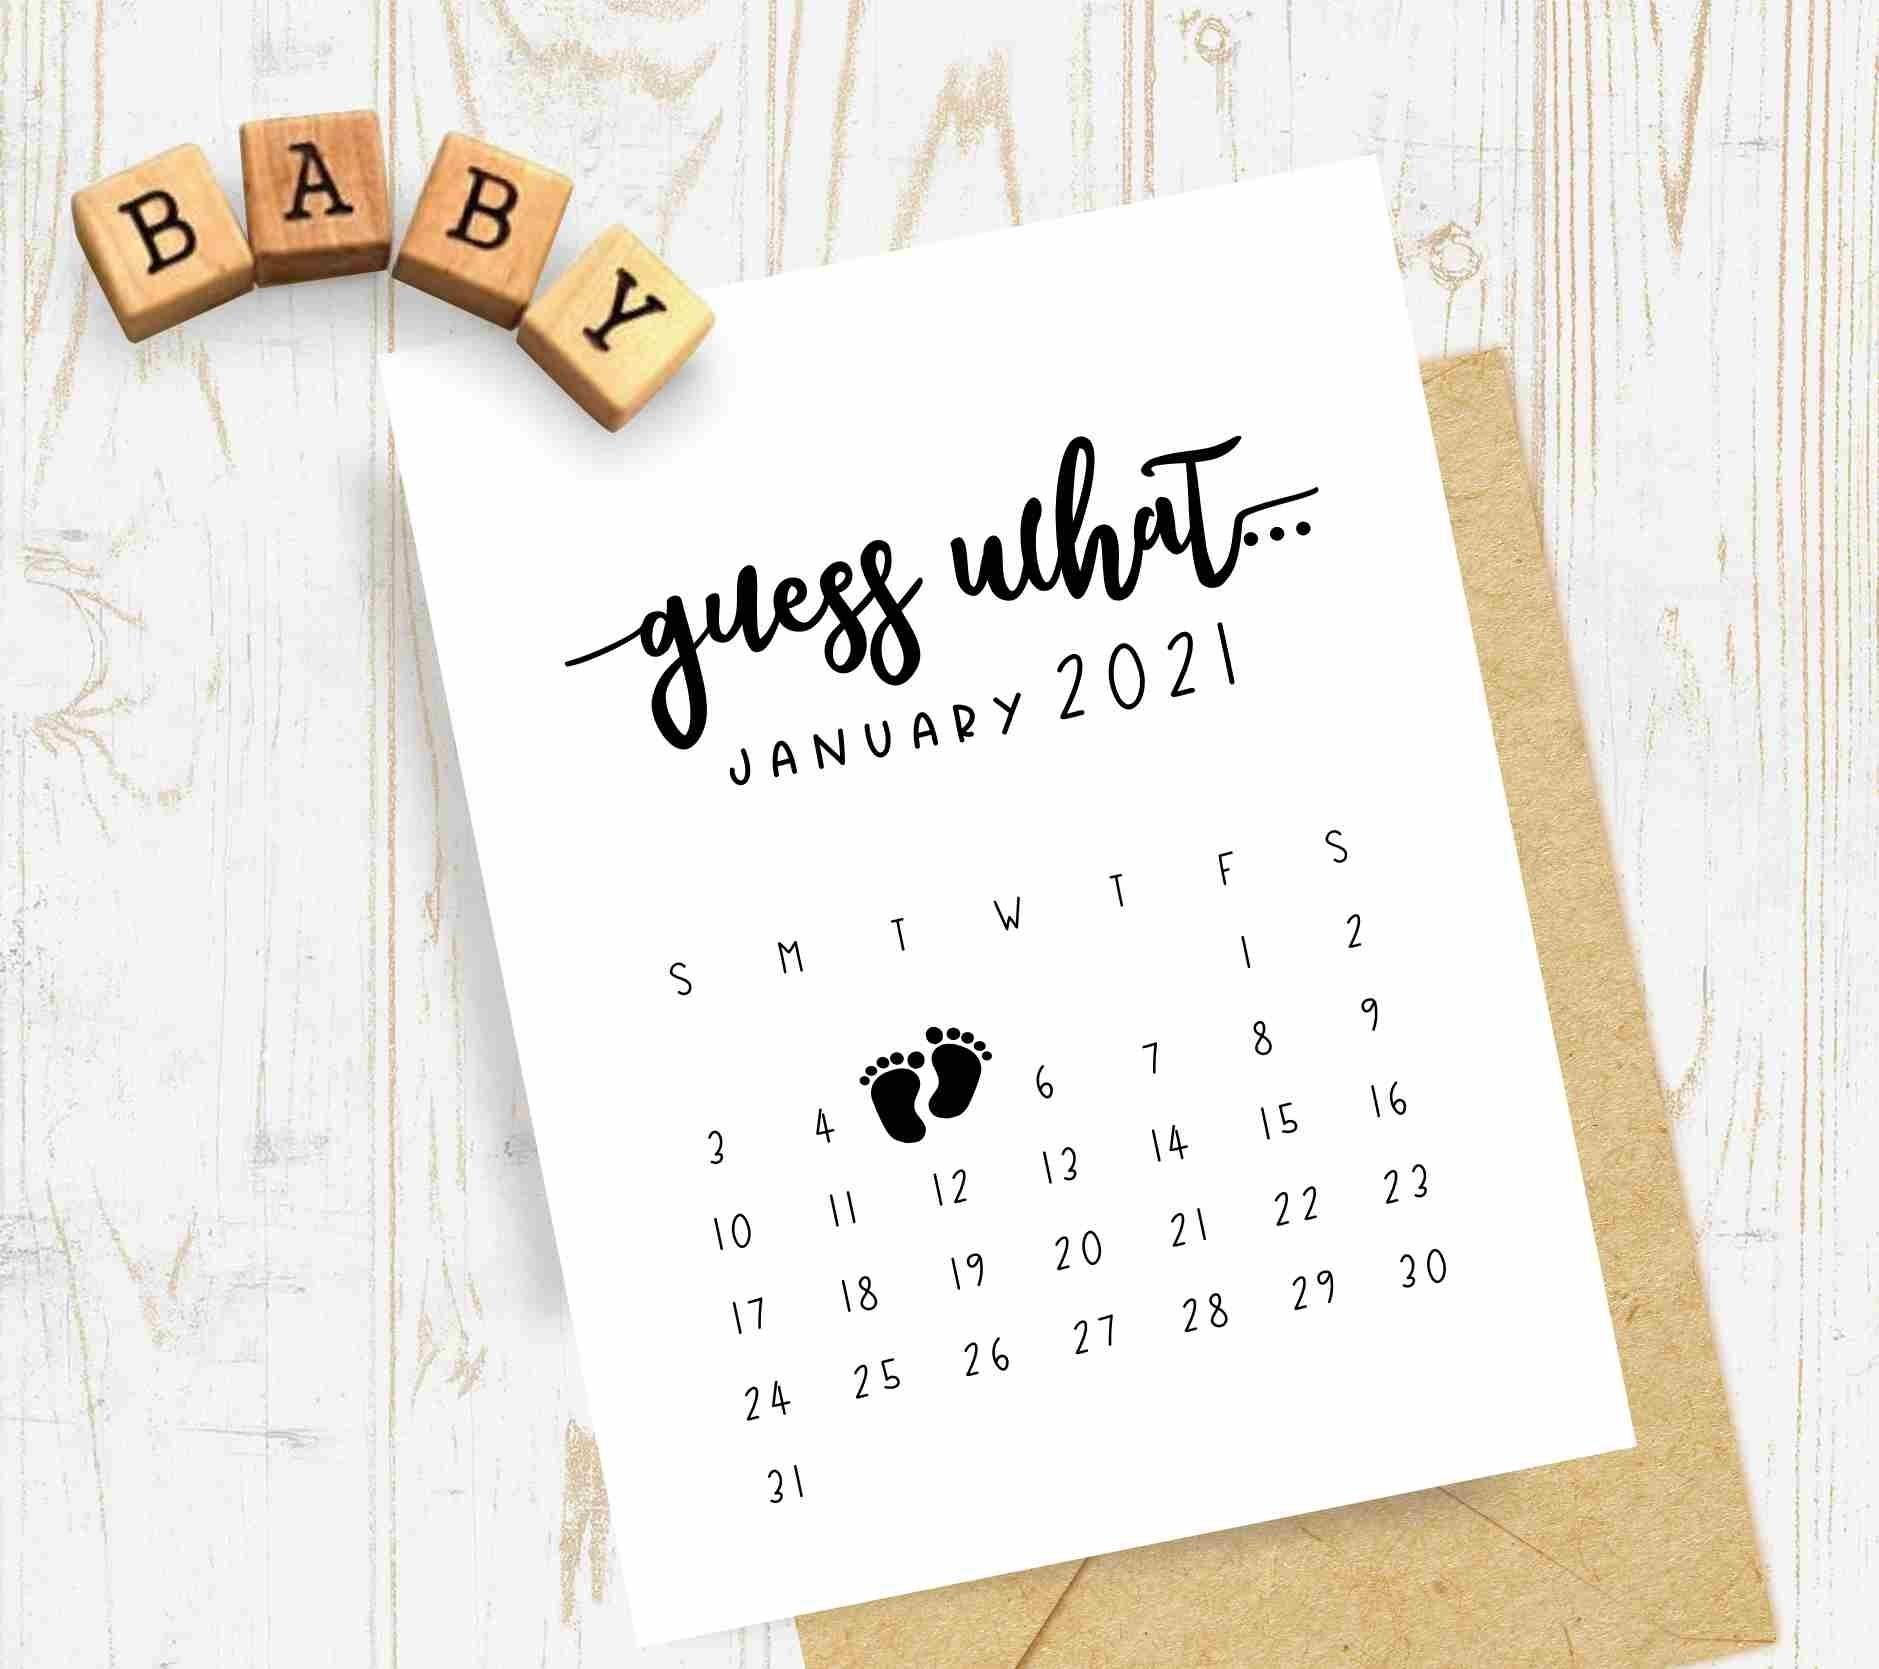 Pregnancy Announcement Calendar - Personalized Guess What Calendar